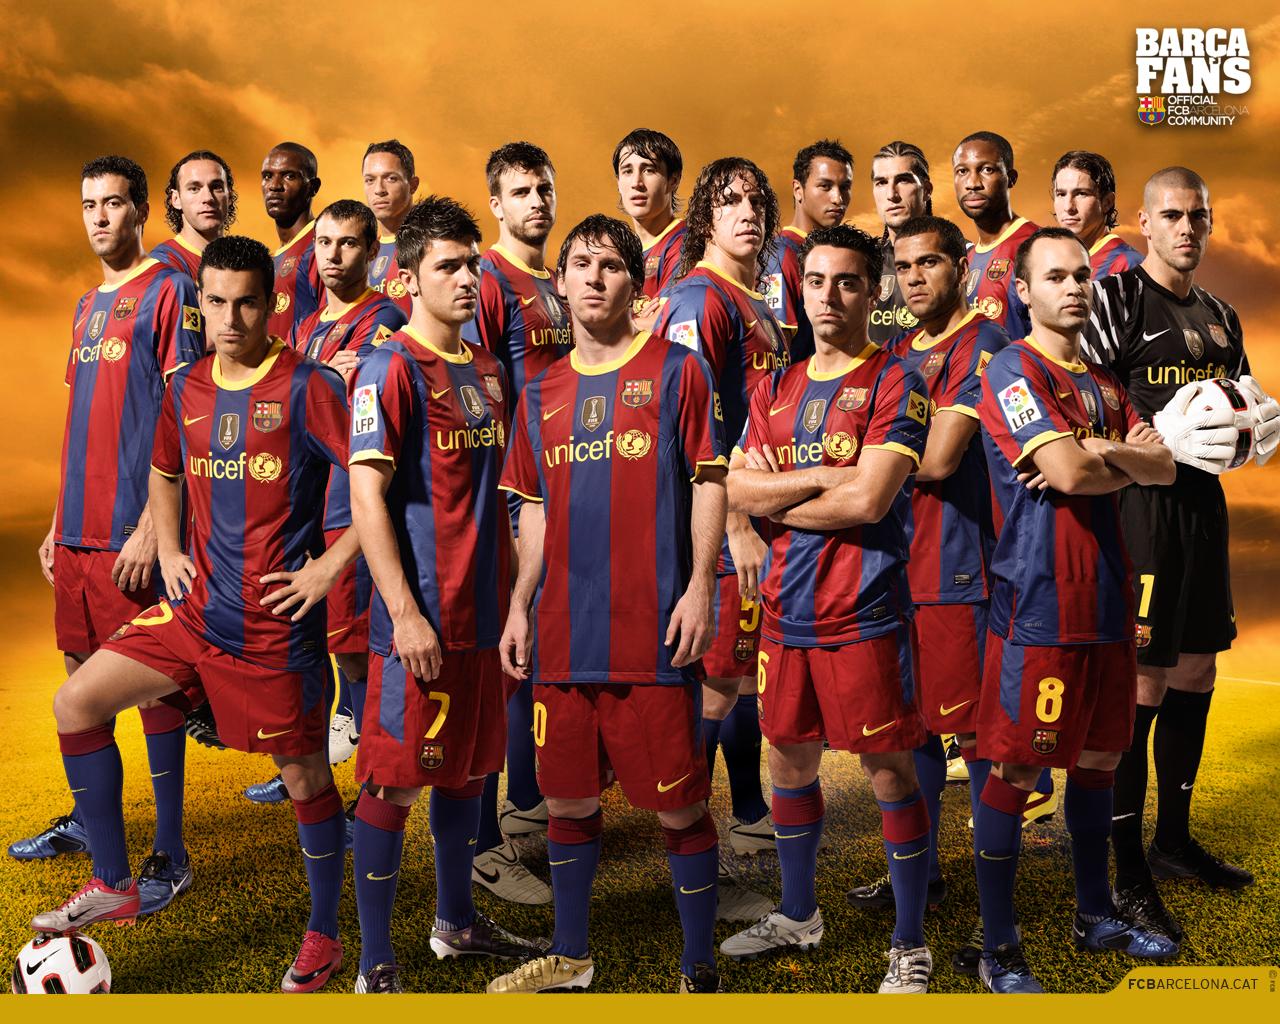 Image 2012 fc barcelona wallpaper hdg barcelona football 2012 fc barcelona wallpaper hdg voltagebd Choice Image